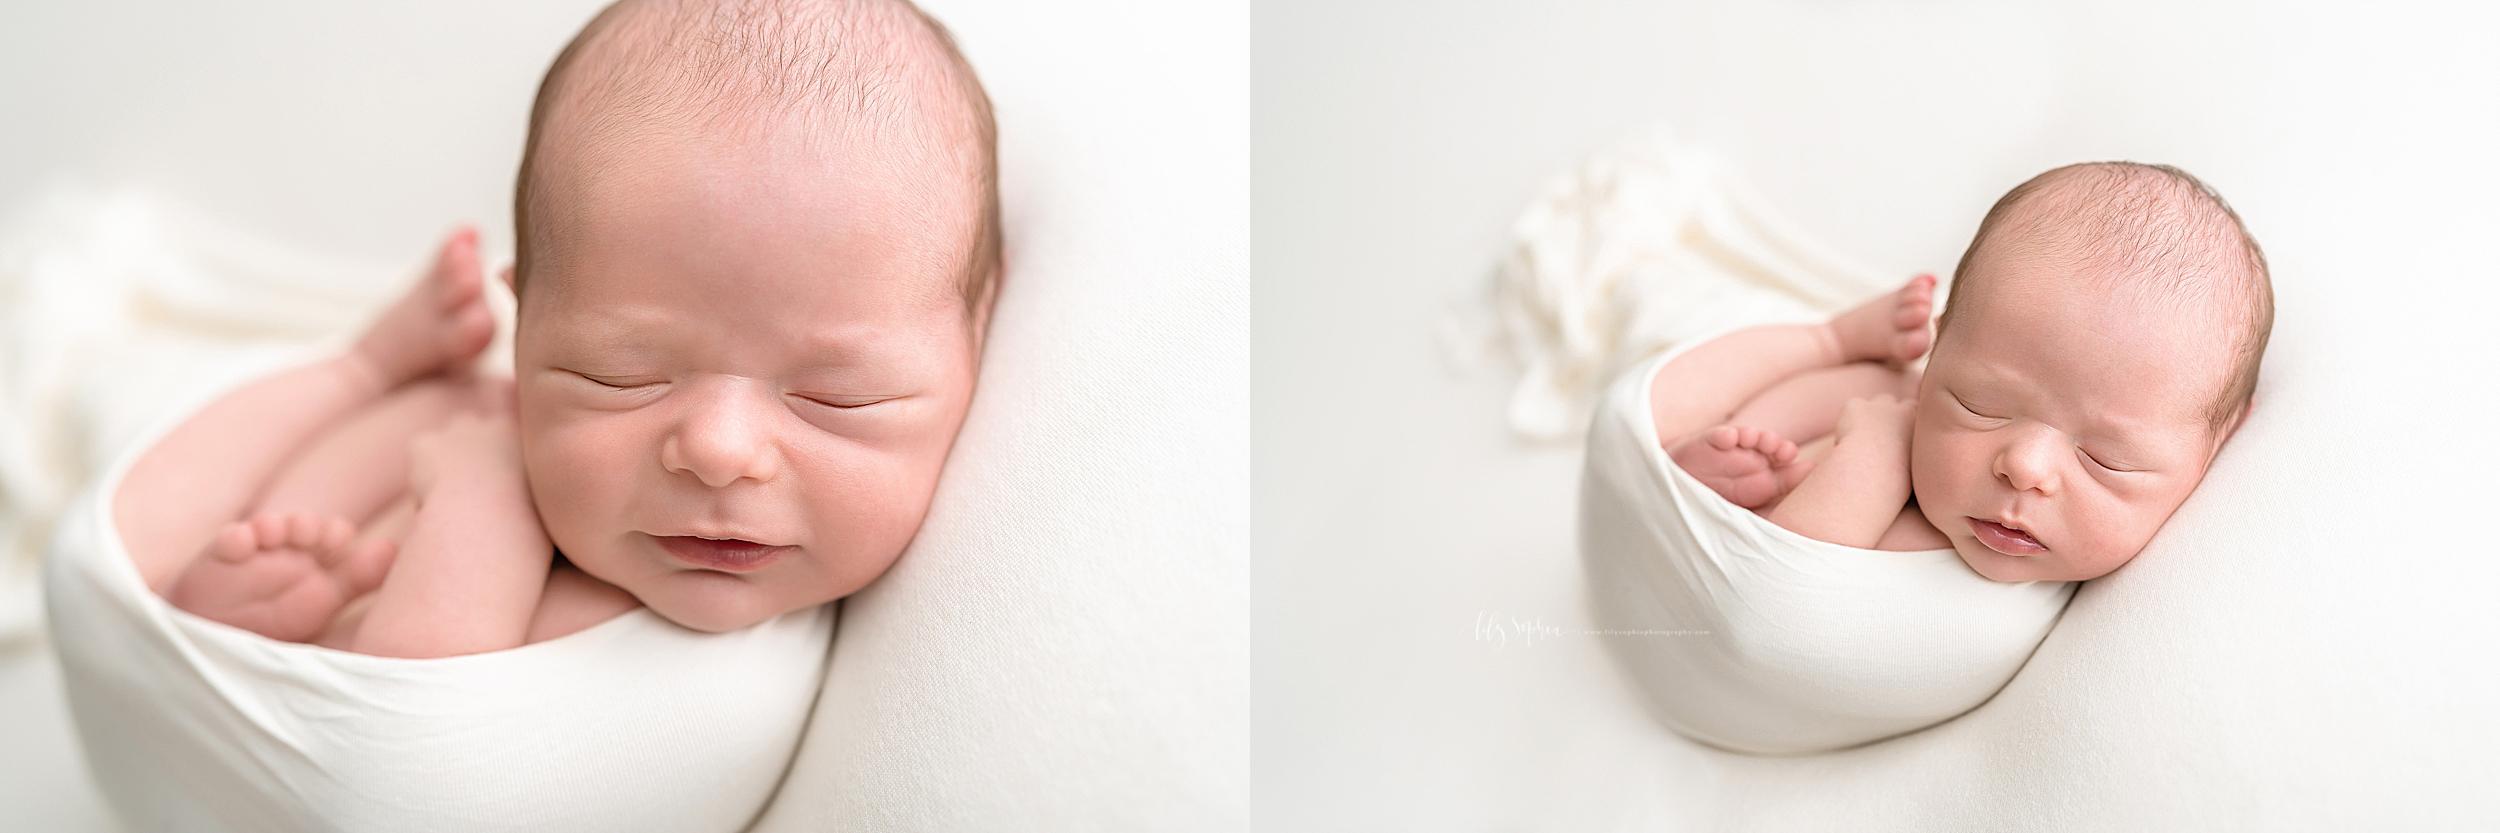 atlanta-cumming-brookhaven-alpharetta-virginia-highlands-smyrna-decatur-lily-sophia-photography-studio-newborn-baby-boy-family-new-parents_0720.jpg